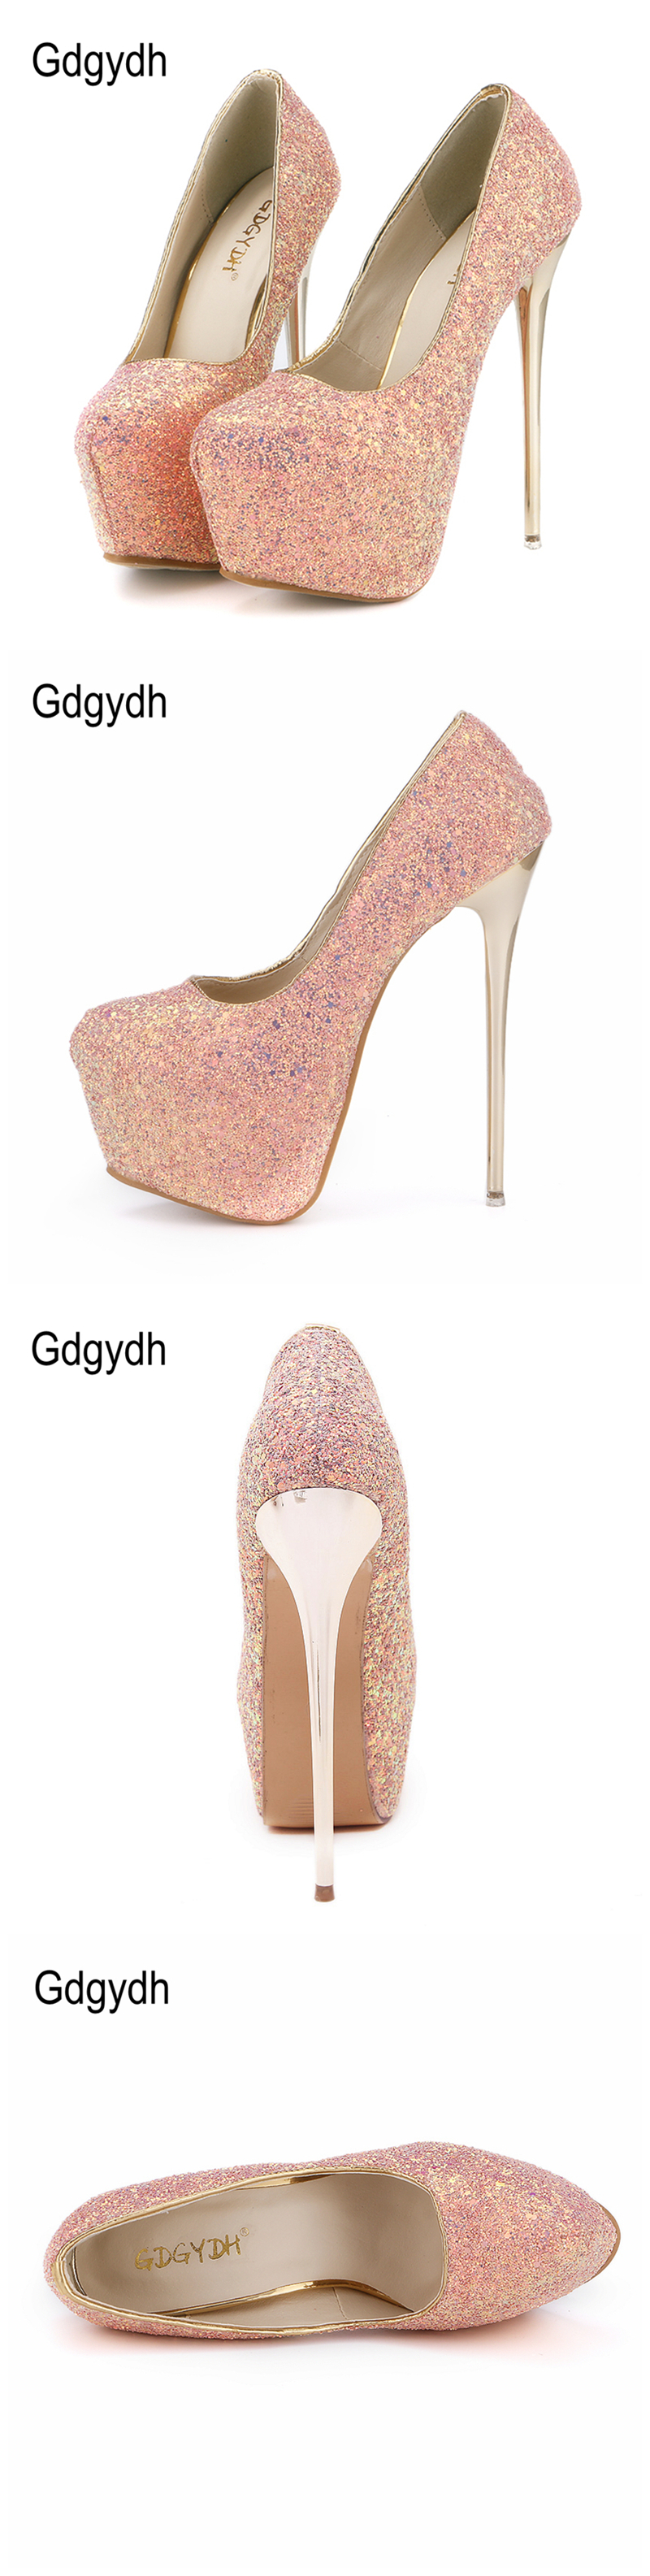 HTB1YMQBRVXXXXXEapXXq6xXFXXXZ - Gdgydh Fashion Women Platform Shoes 2017 New Spring Autumn Bling Women Pumps Thin Heels Sexy Slim Party Shoes High Heels